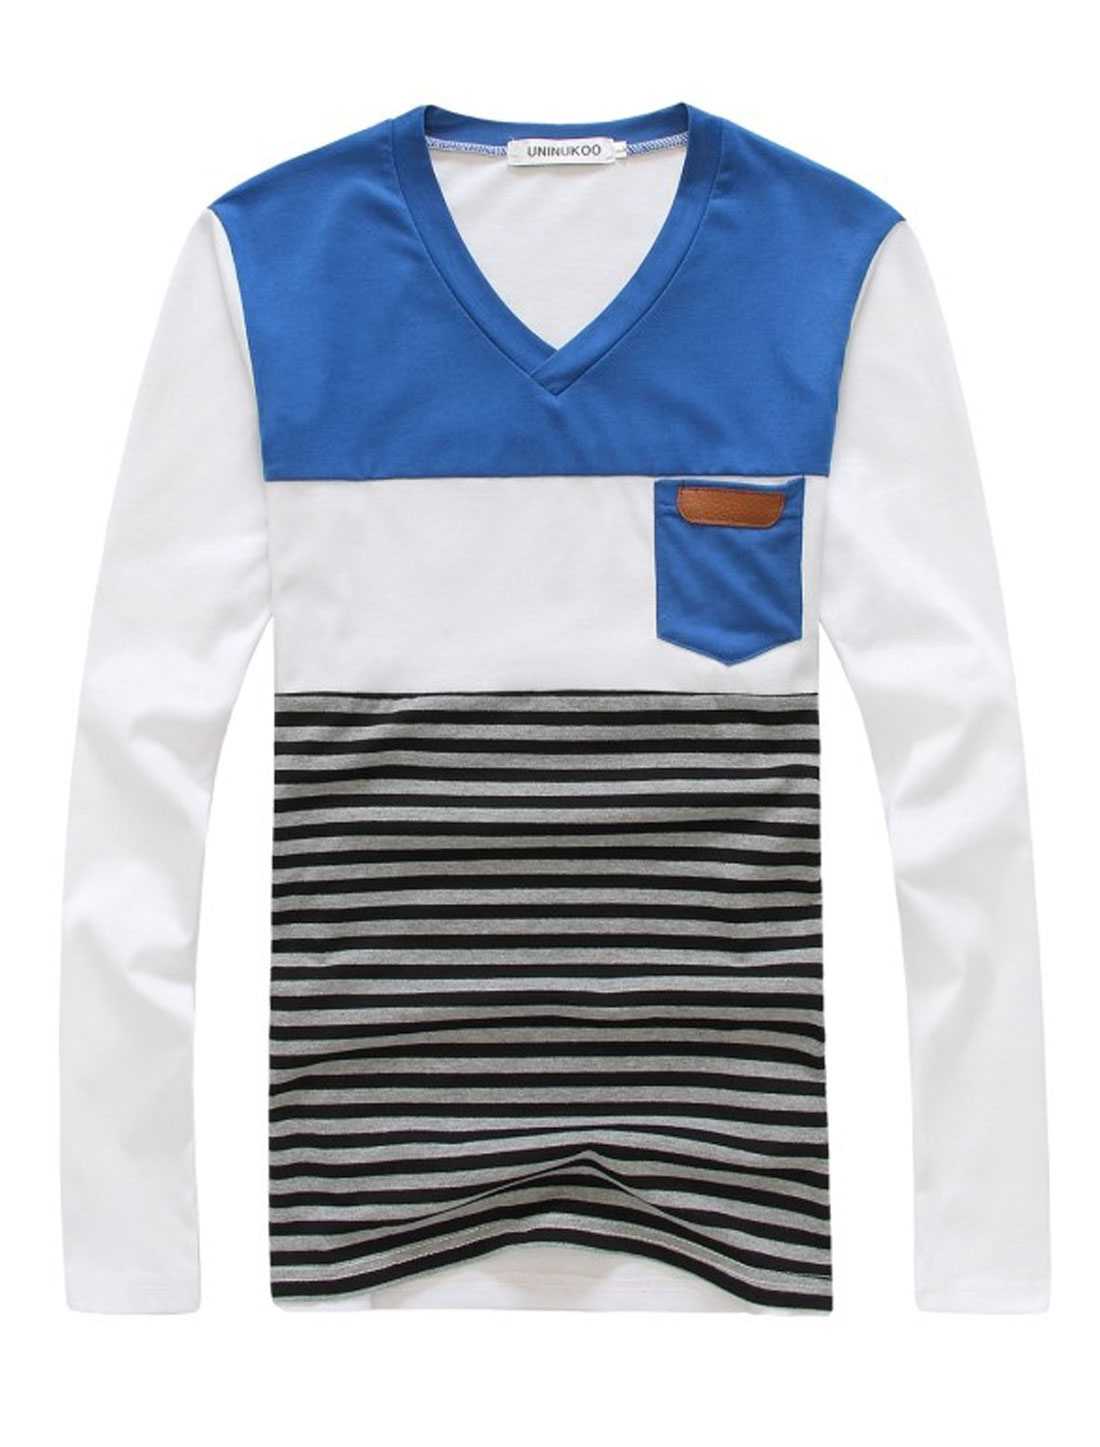 Men V Neck Splicing Stripes Pattern Trendy Slim Tee Blue M